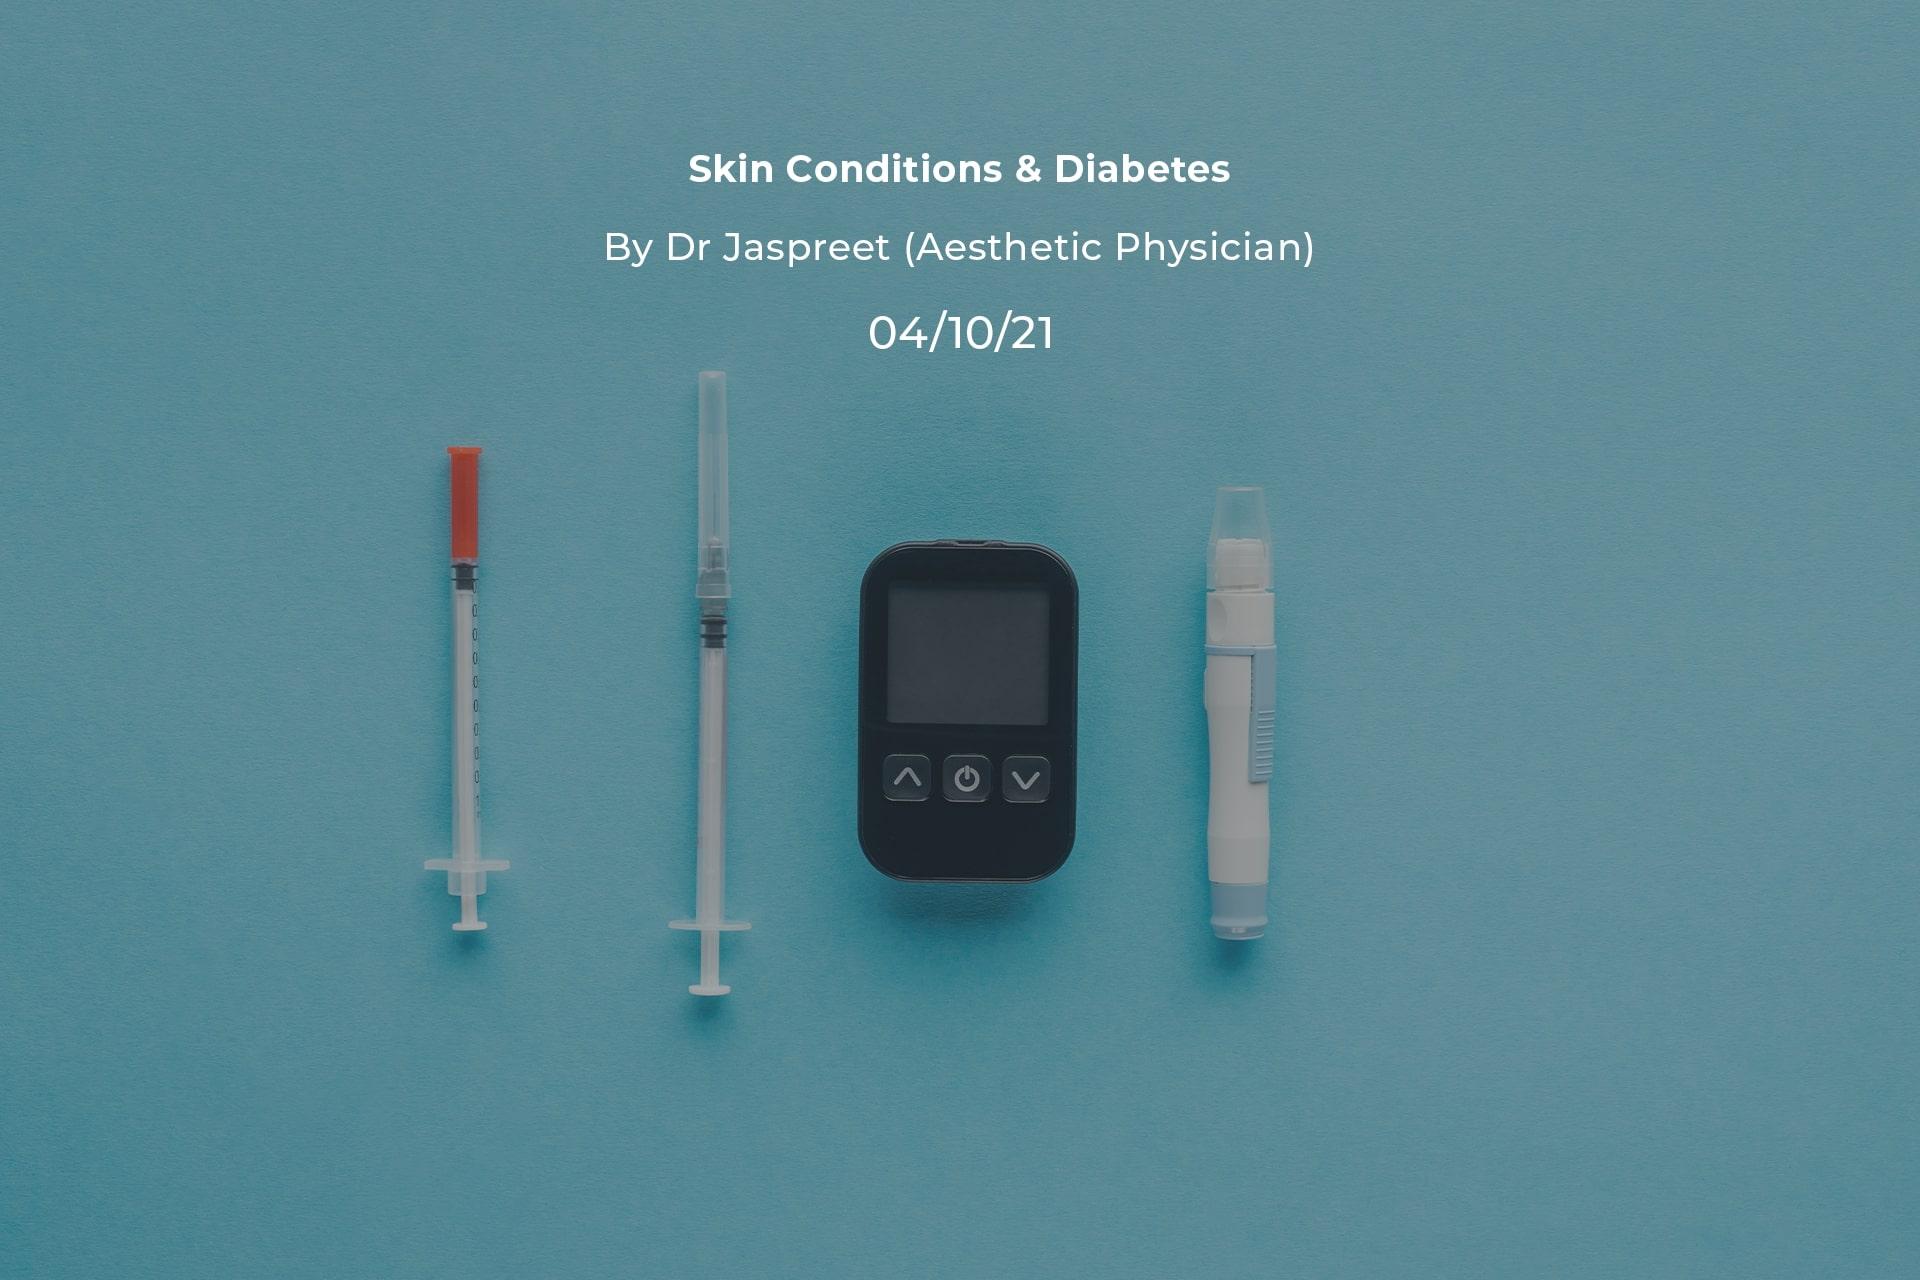 Skin Conditions & Diabetes